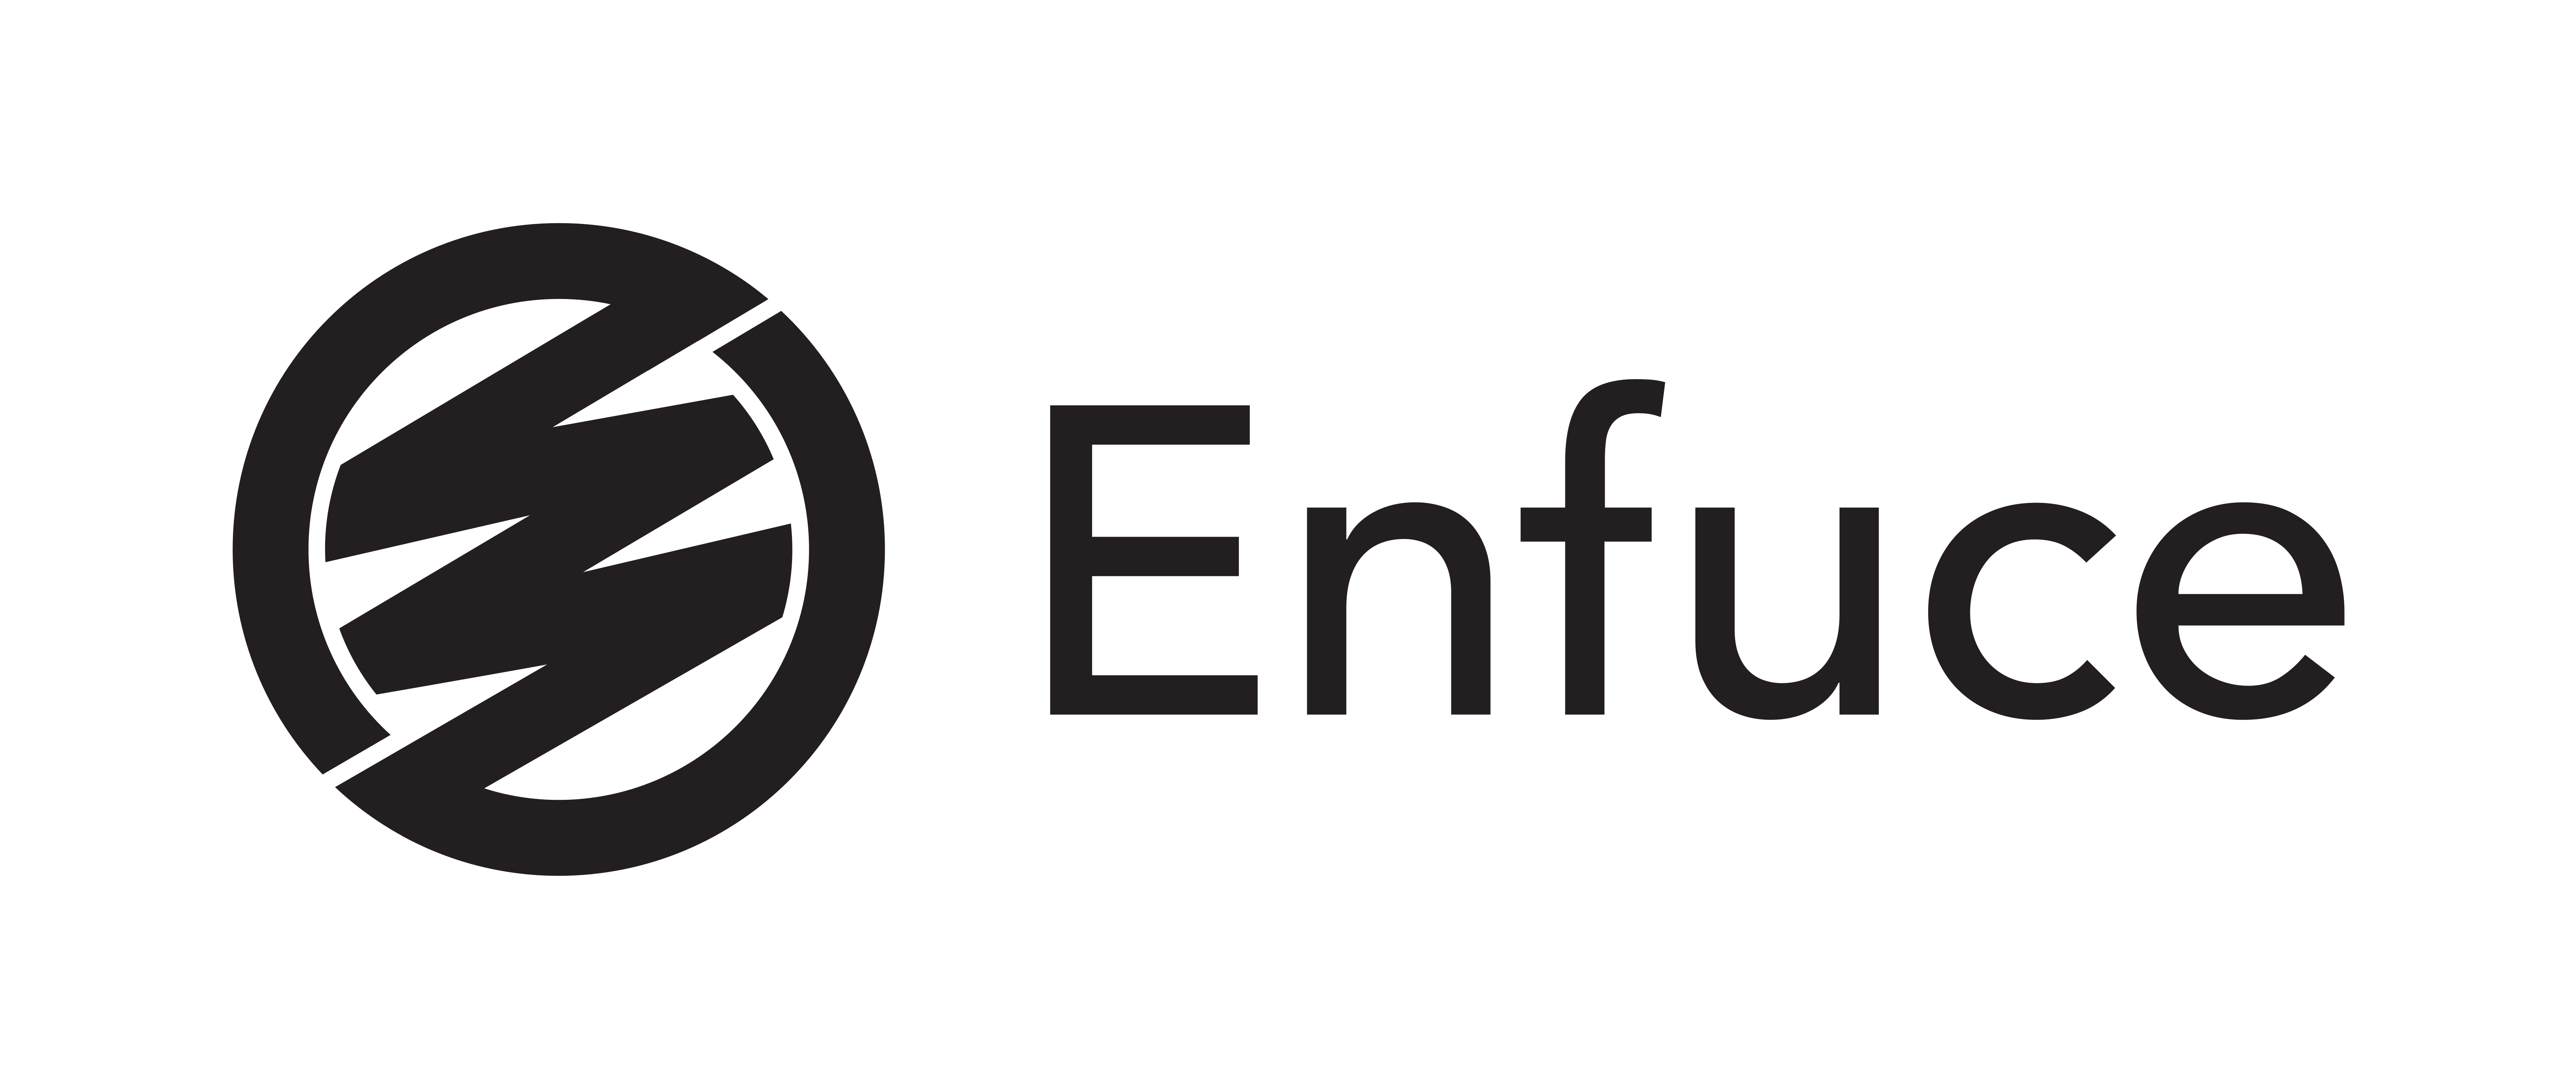 Enfuce's logo